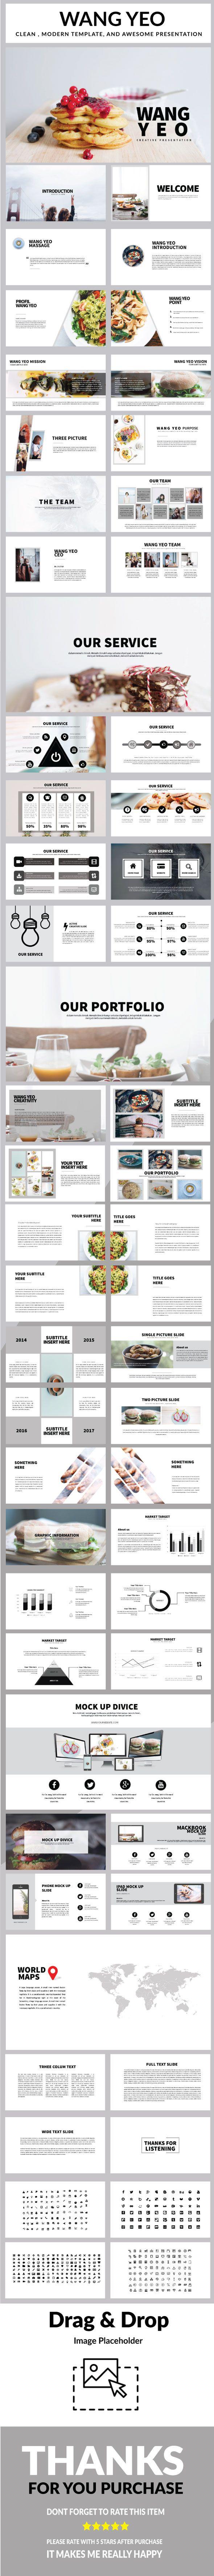 Wang yeo Multipurpose Powerpoint (PowerPoint Templates ...